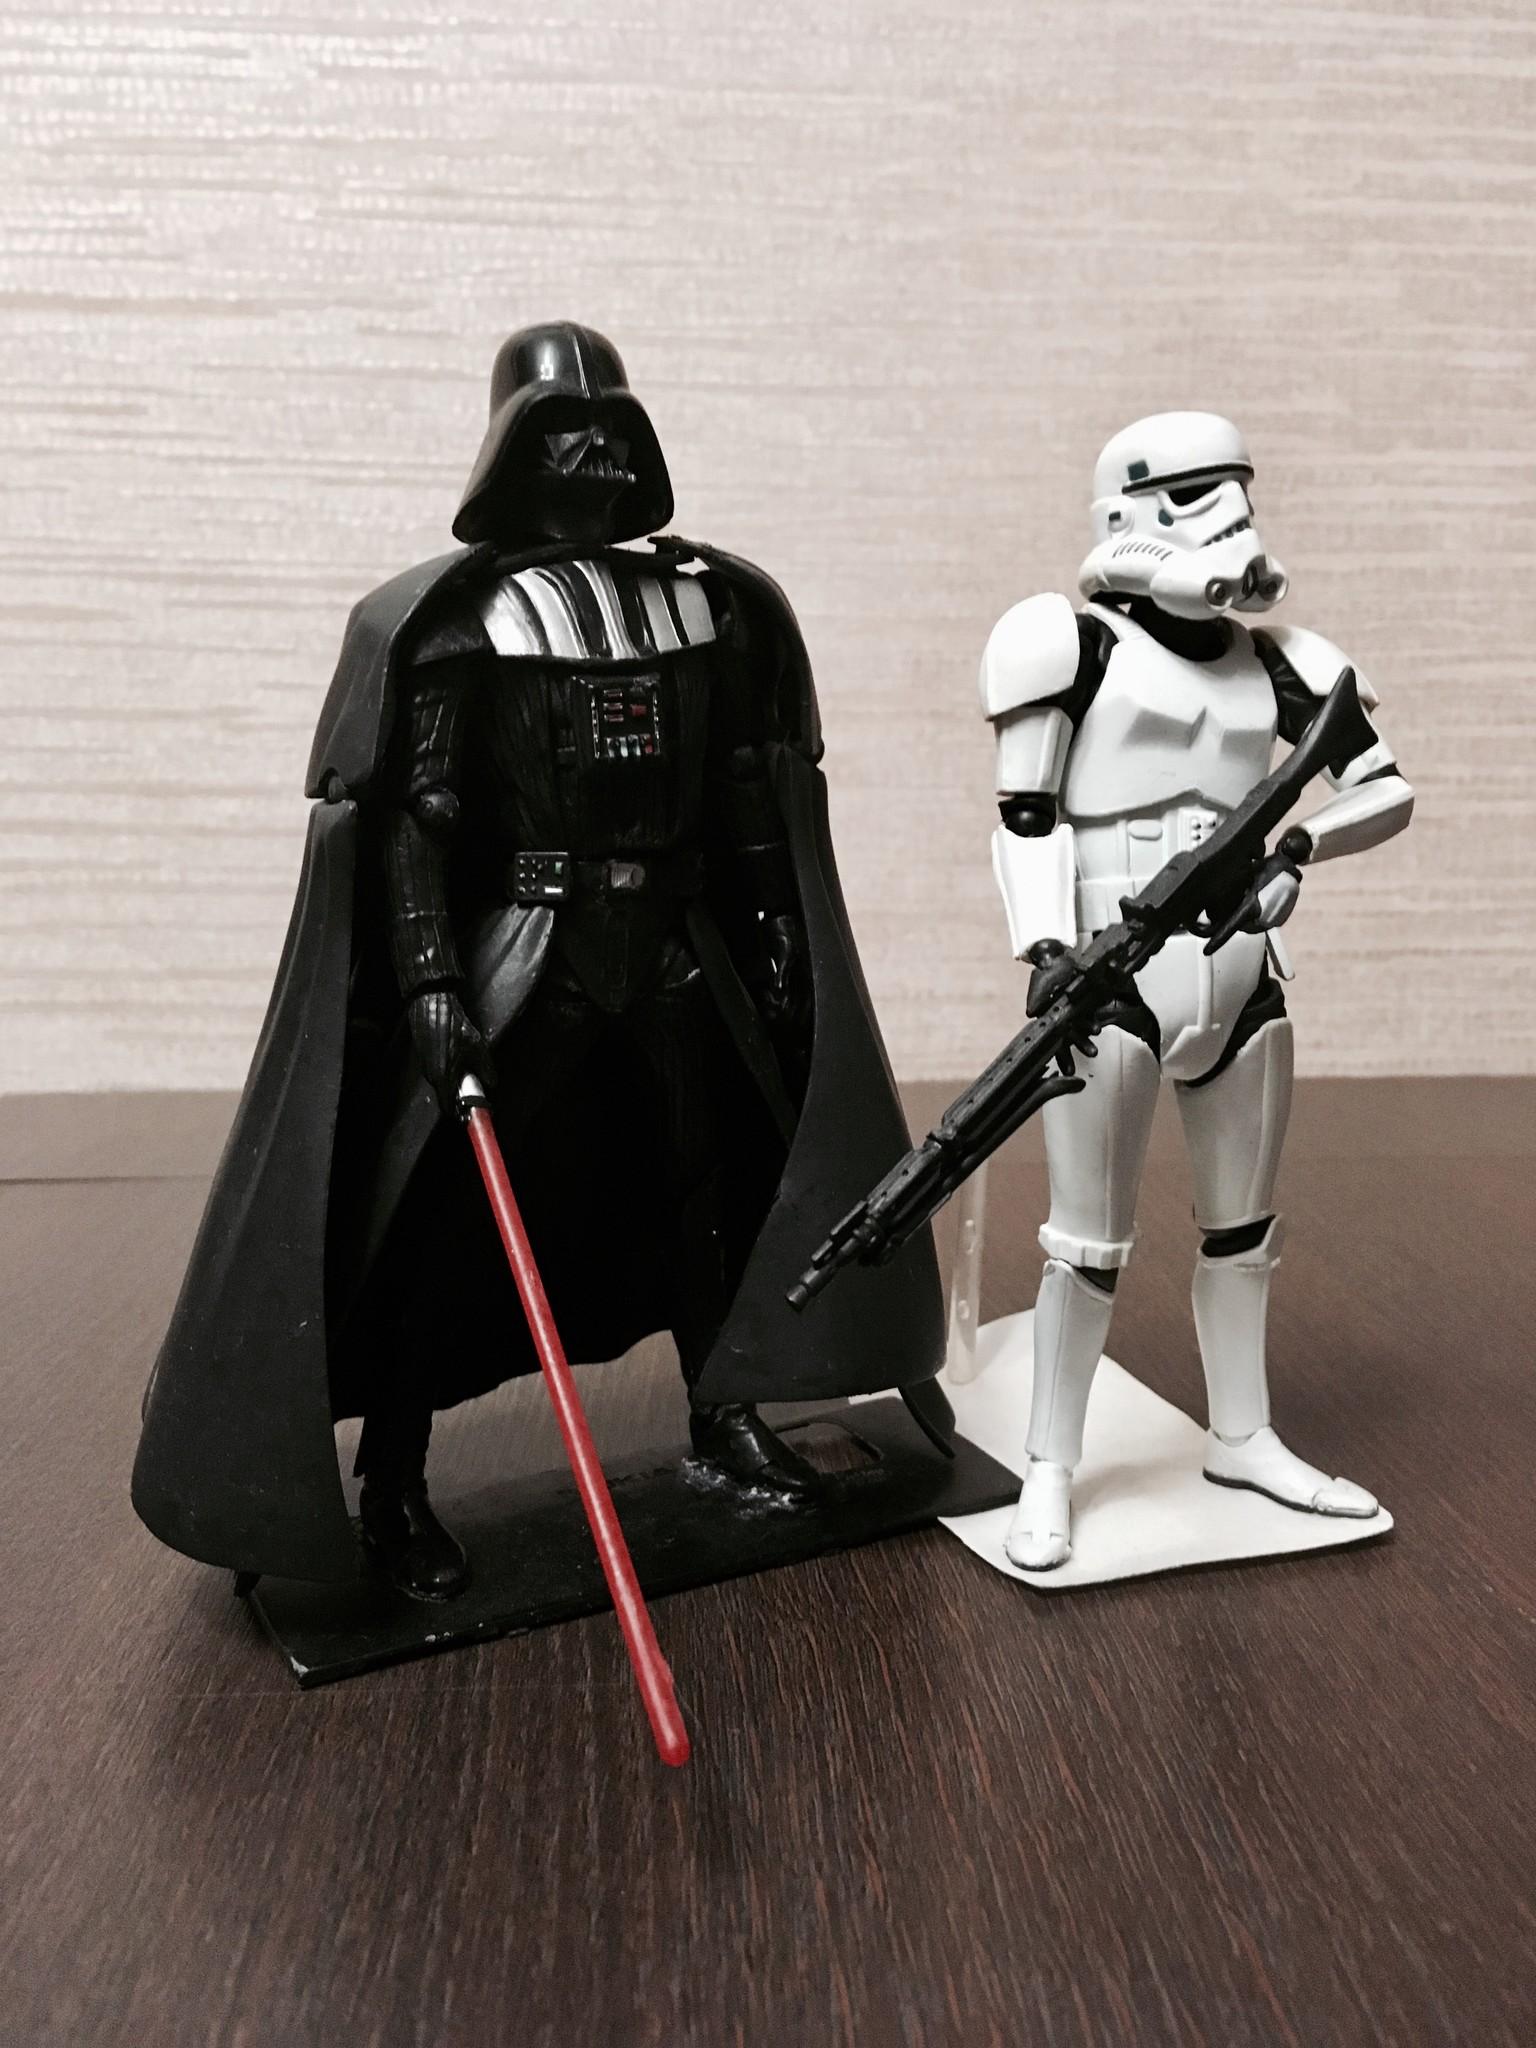 revoltech kaiyodo star_wars darth_vader stormtrooper yamaguchi_katsuhisa lucasfilm star_wars:_revo